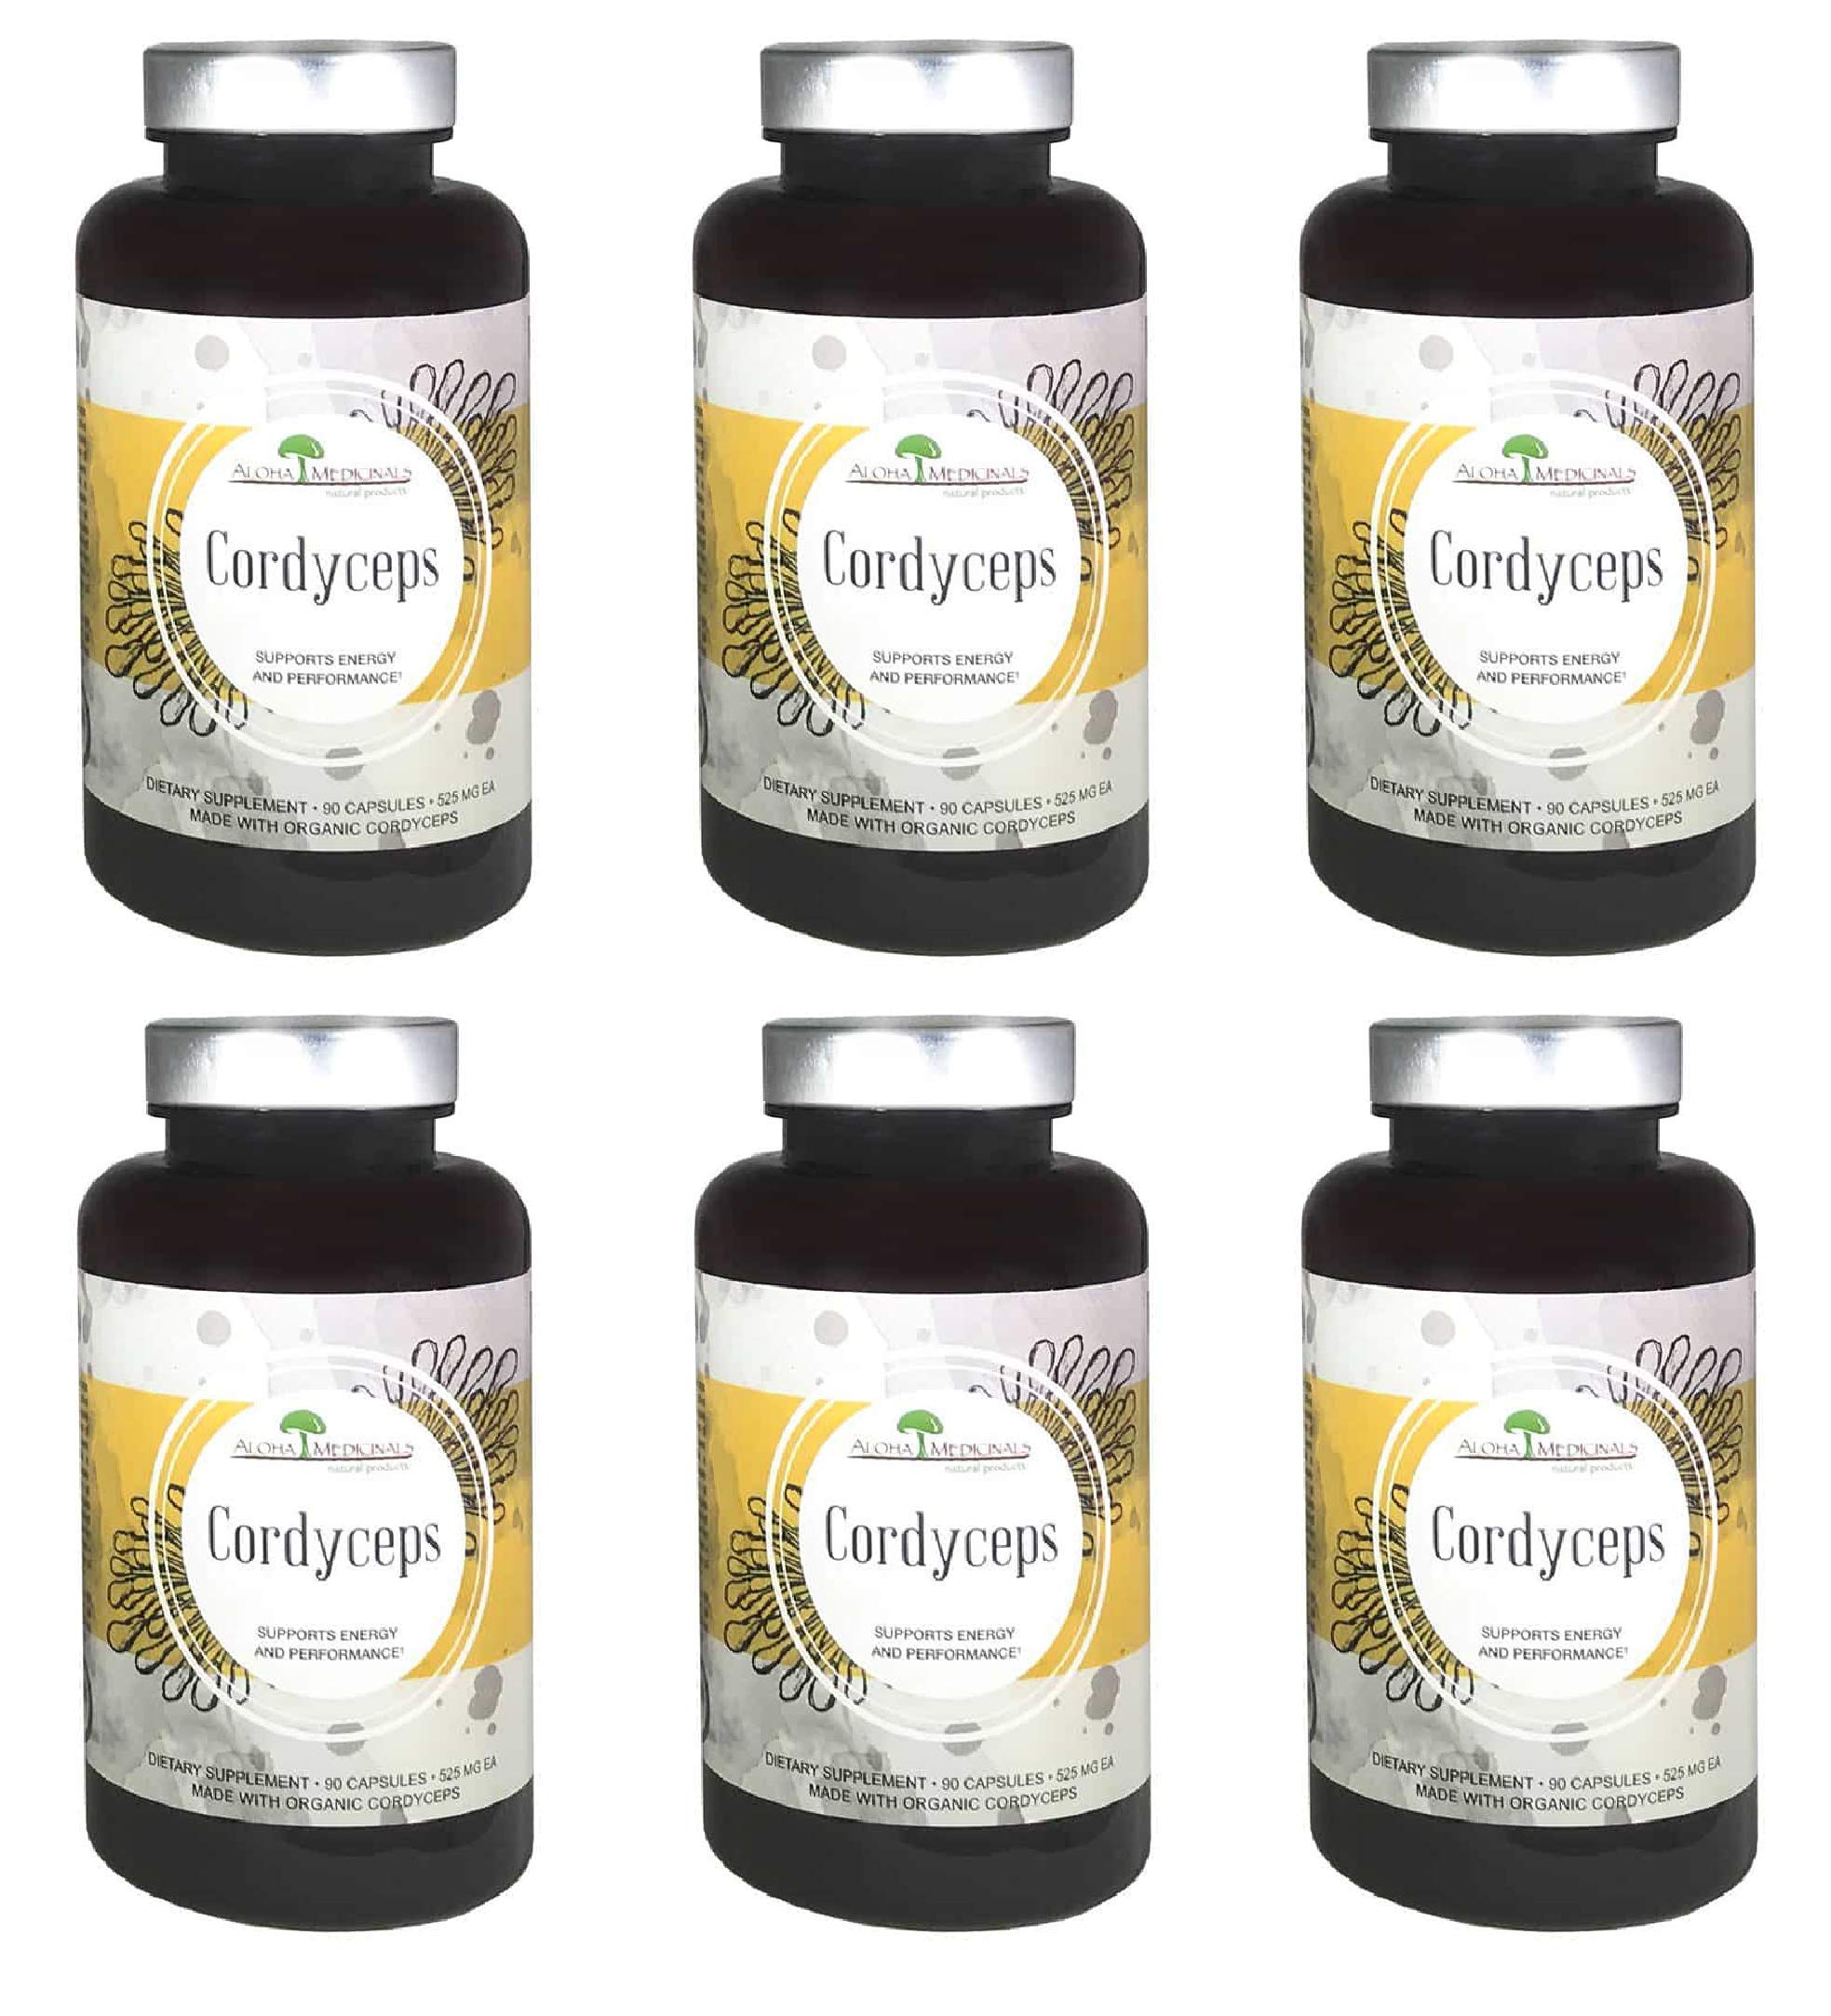 Aloha Medicinals - Pure Cordyceps - Certified Organic Mushrooms – Cordyceps Militaris – Cordyceps Sinensis - Supports Immunity, Energy and Stamina - 525mg - 90 Vegetarian Capsules (6 Pack)